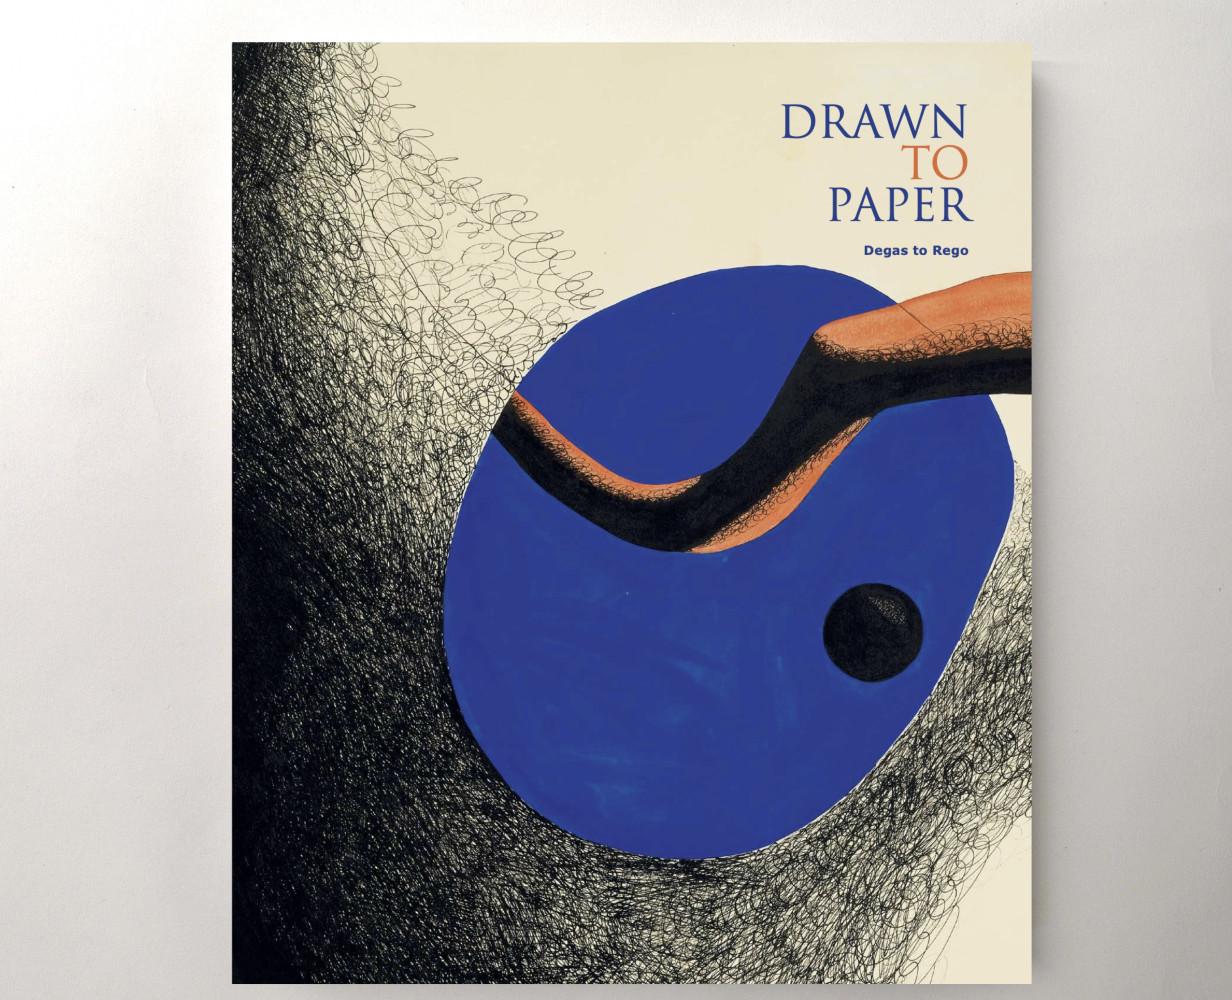 Piano Nobile Publications